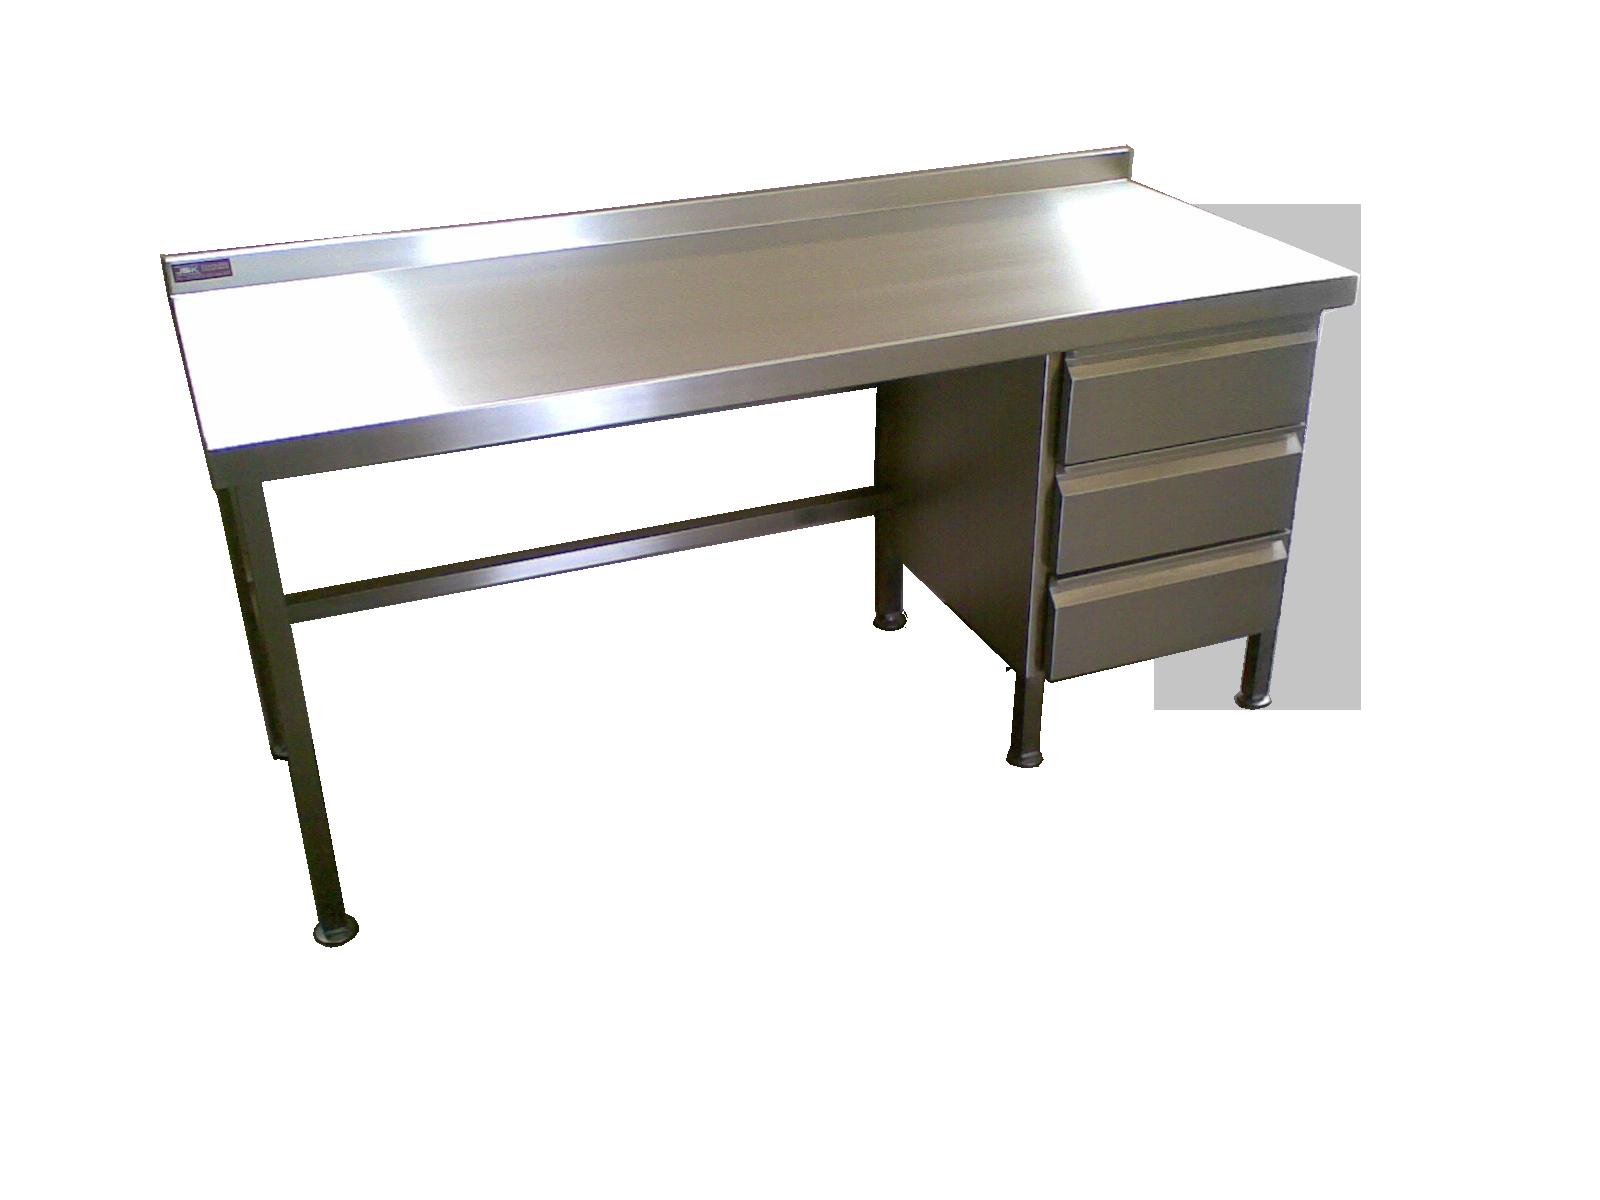 Stainless Steel Desk By J Amp K Stainless Solutions Ltd